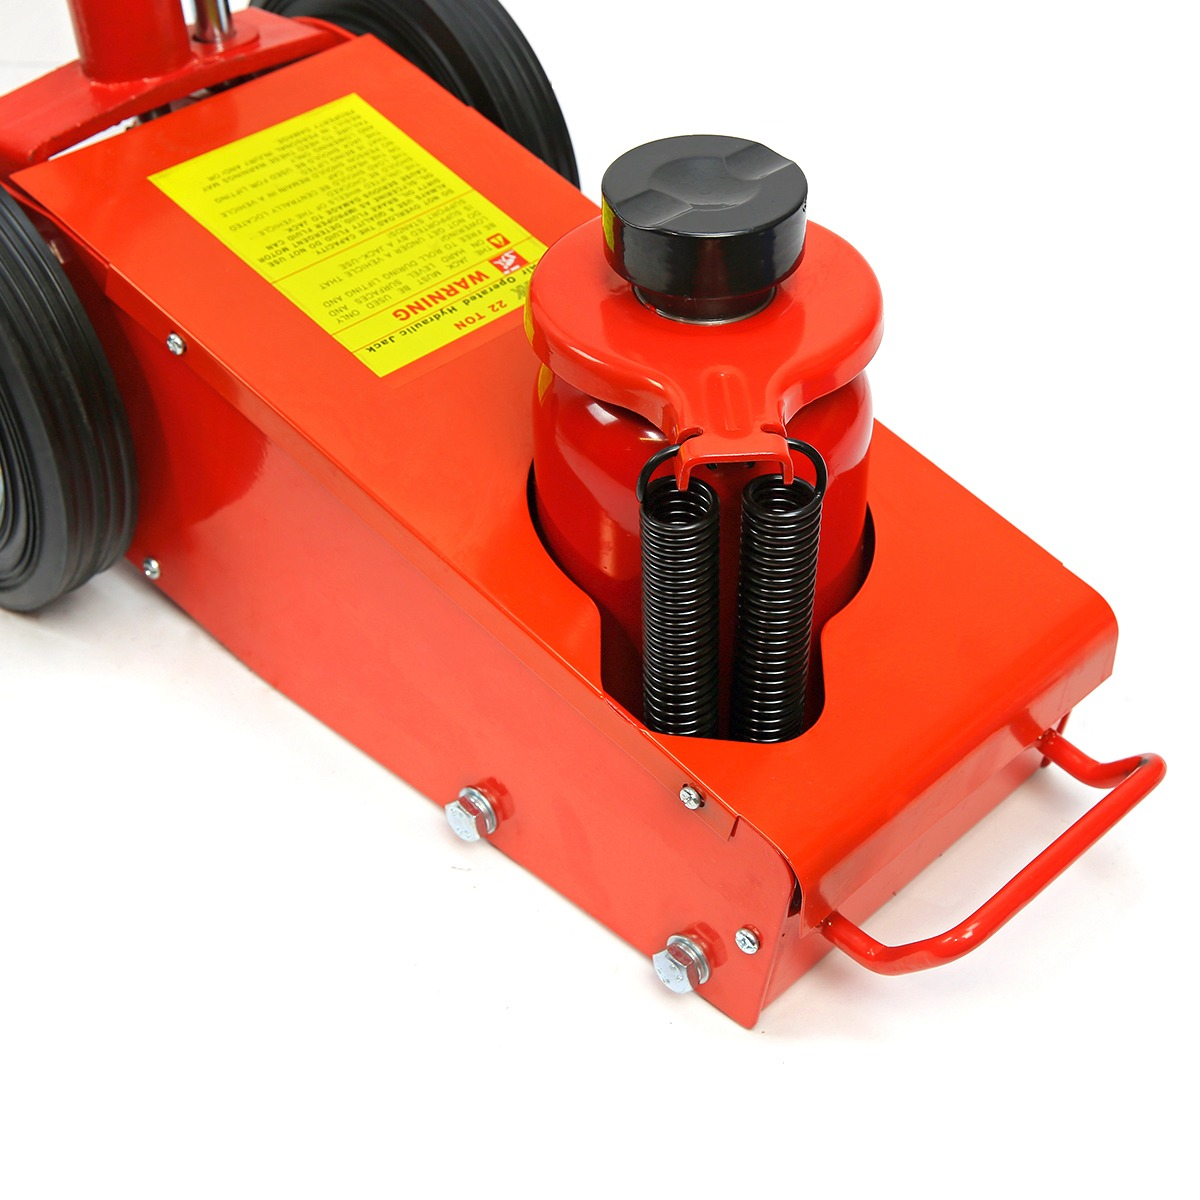 pump jack ton image floor duty rapid jacks with low heavy profile steel